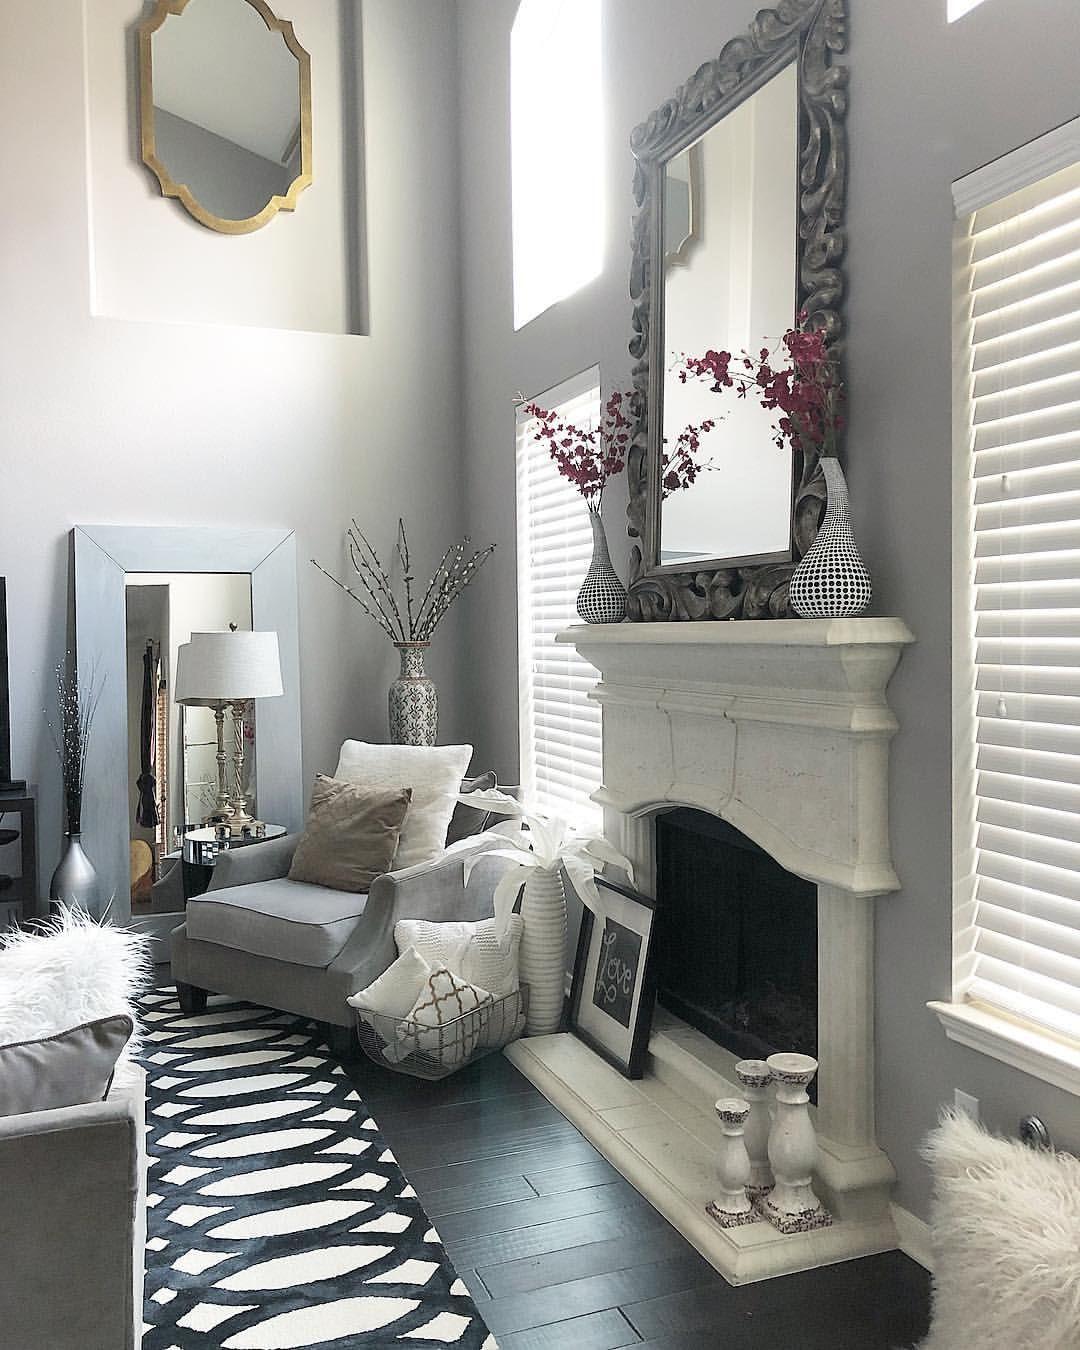 Family Room | Living Room decorations. Home interior ideas ...